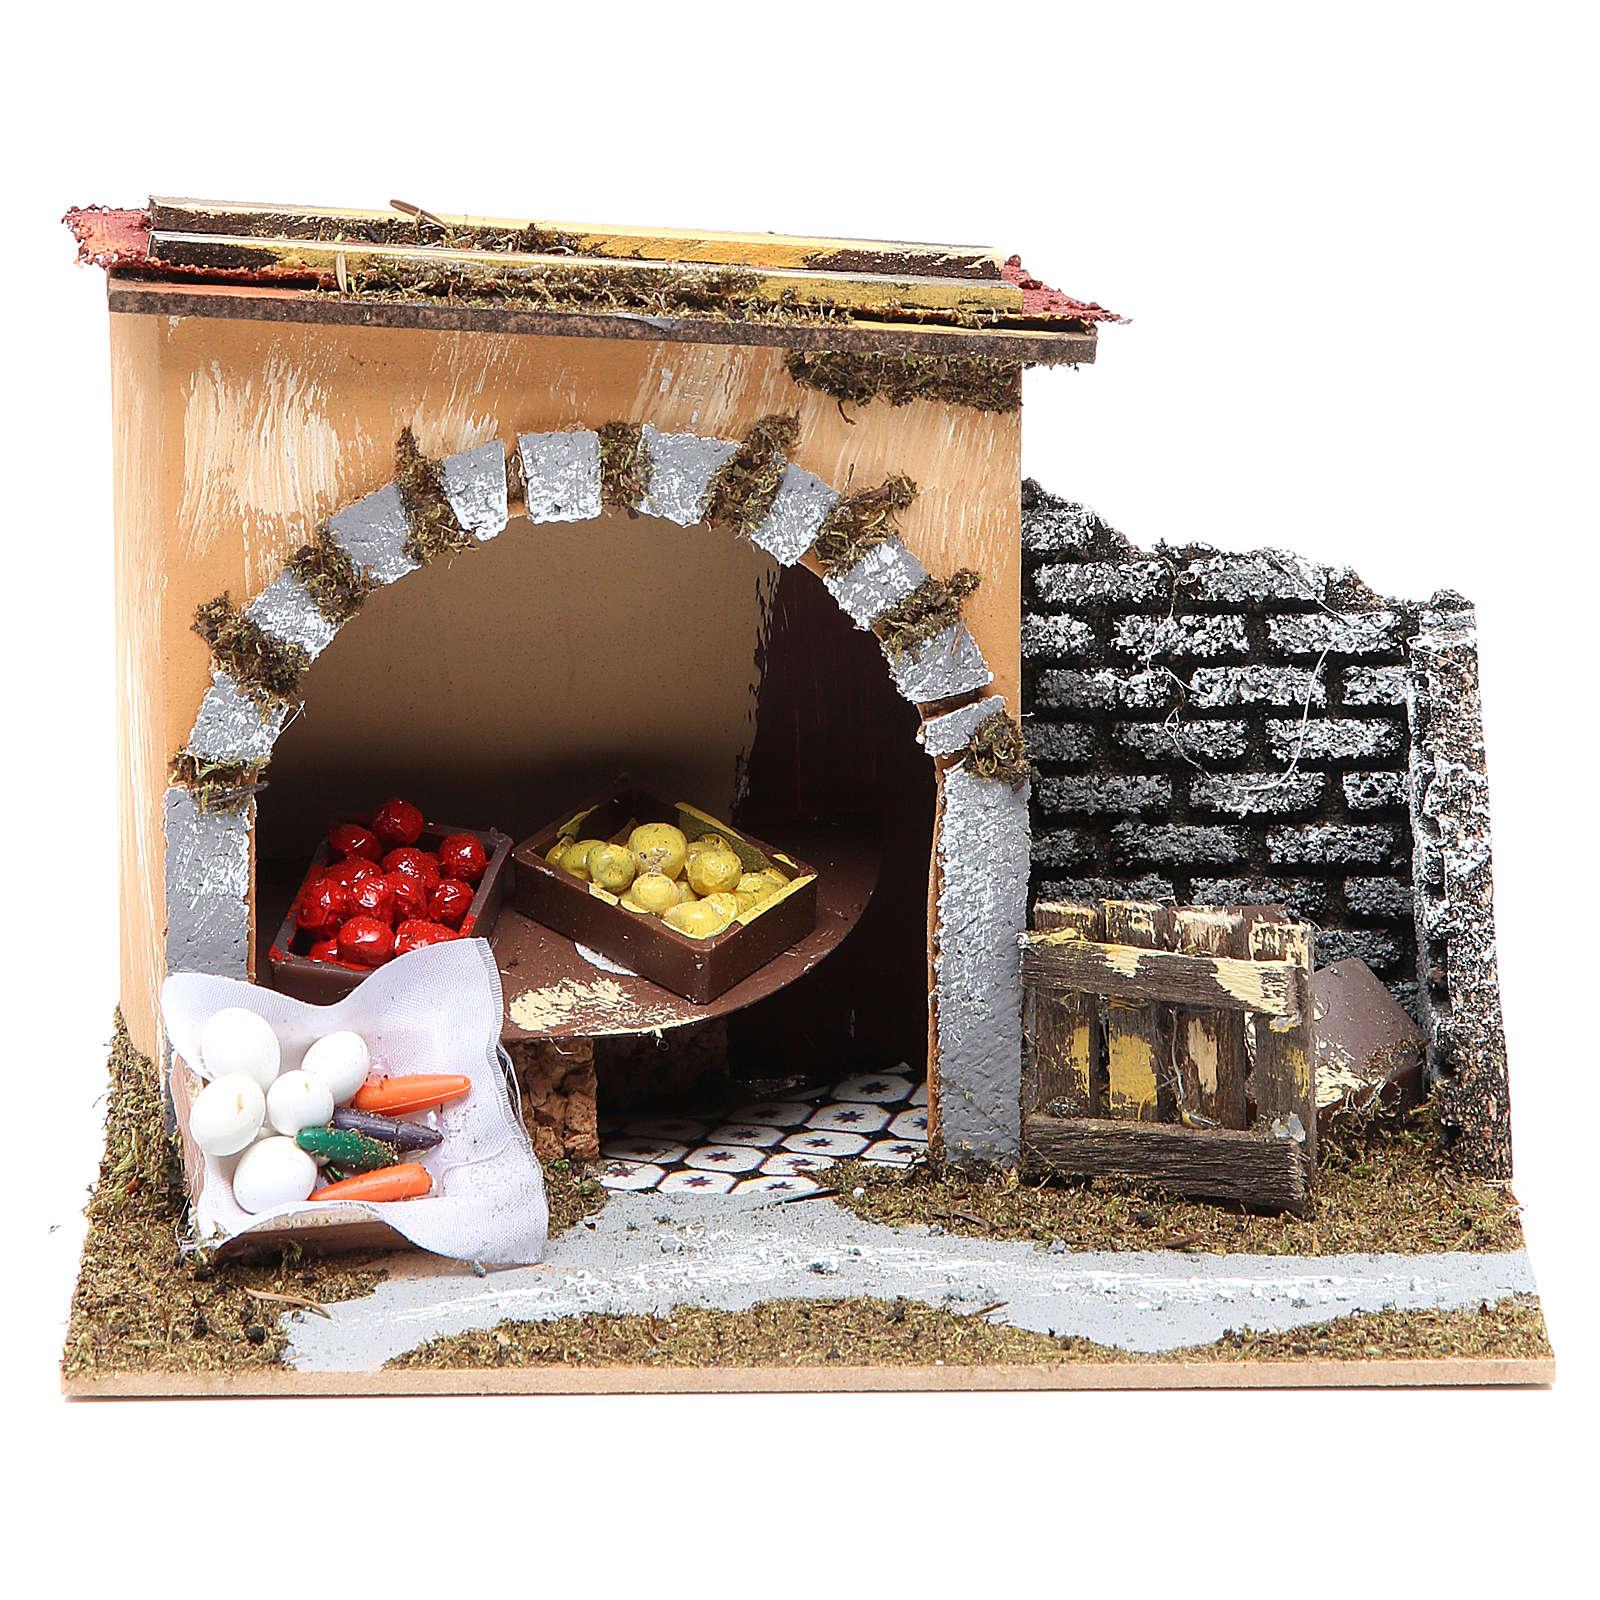 Tienda de fruta para belén 14x20x14 cm 4